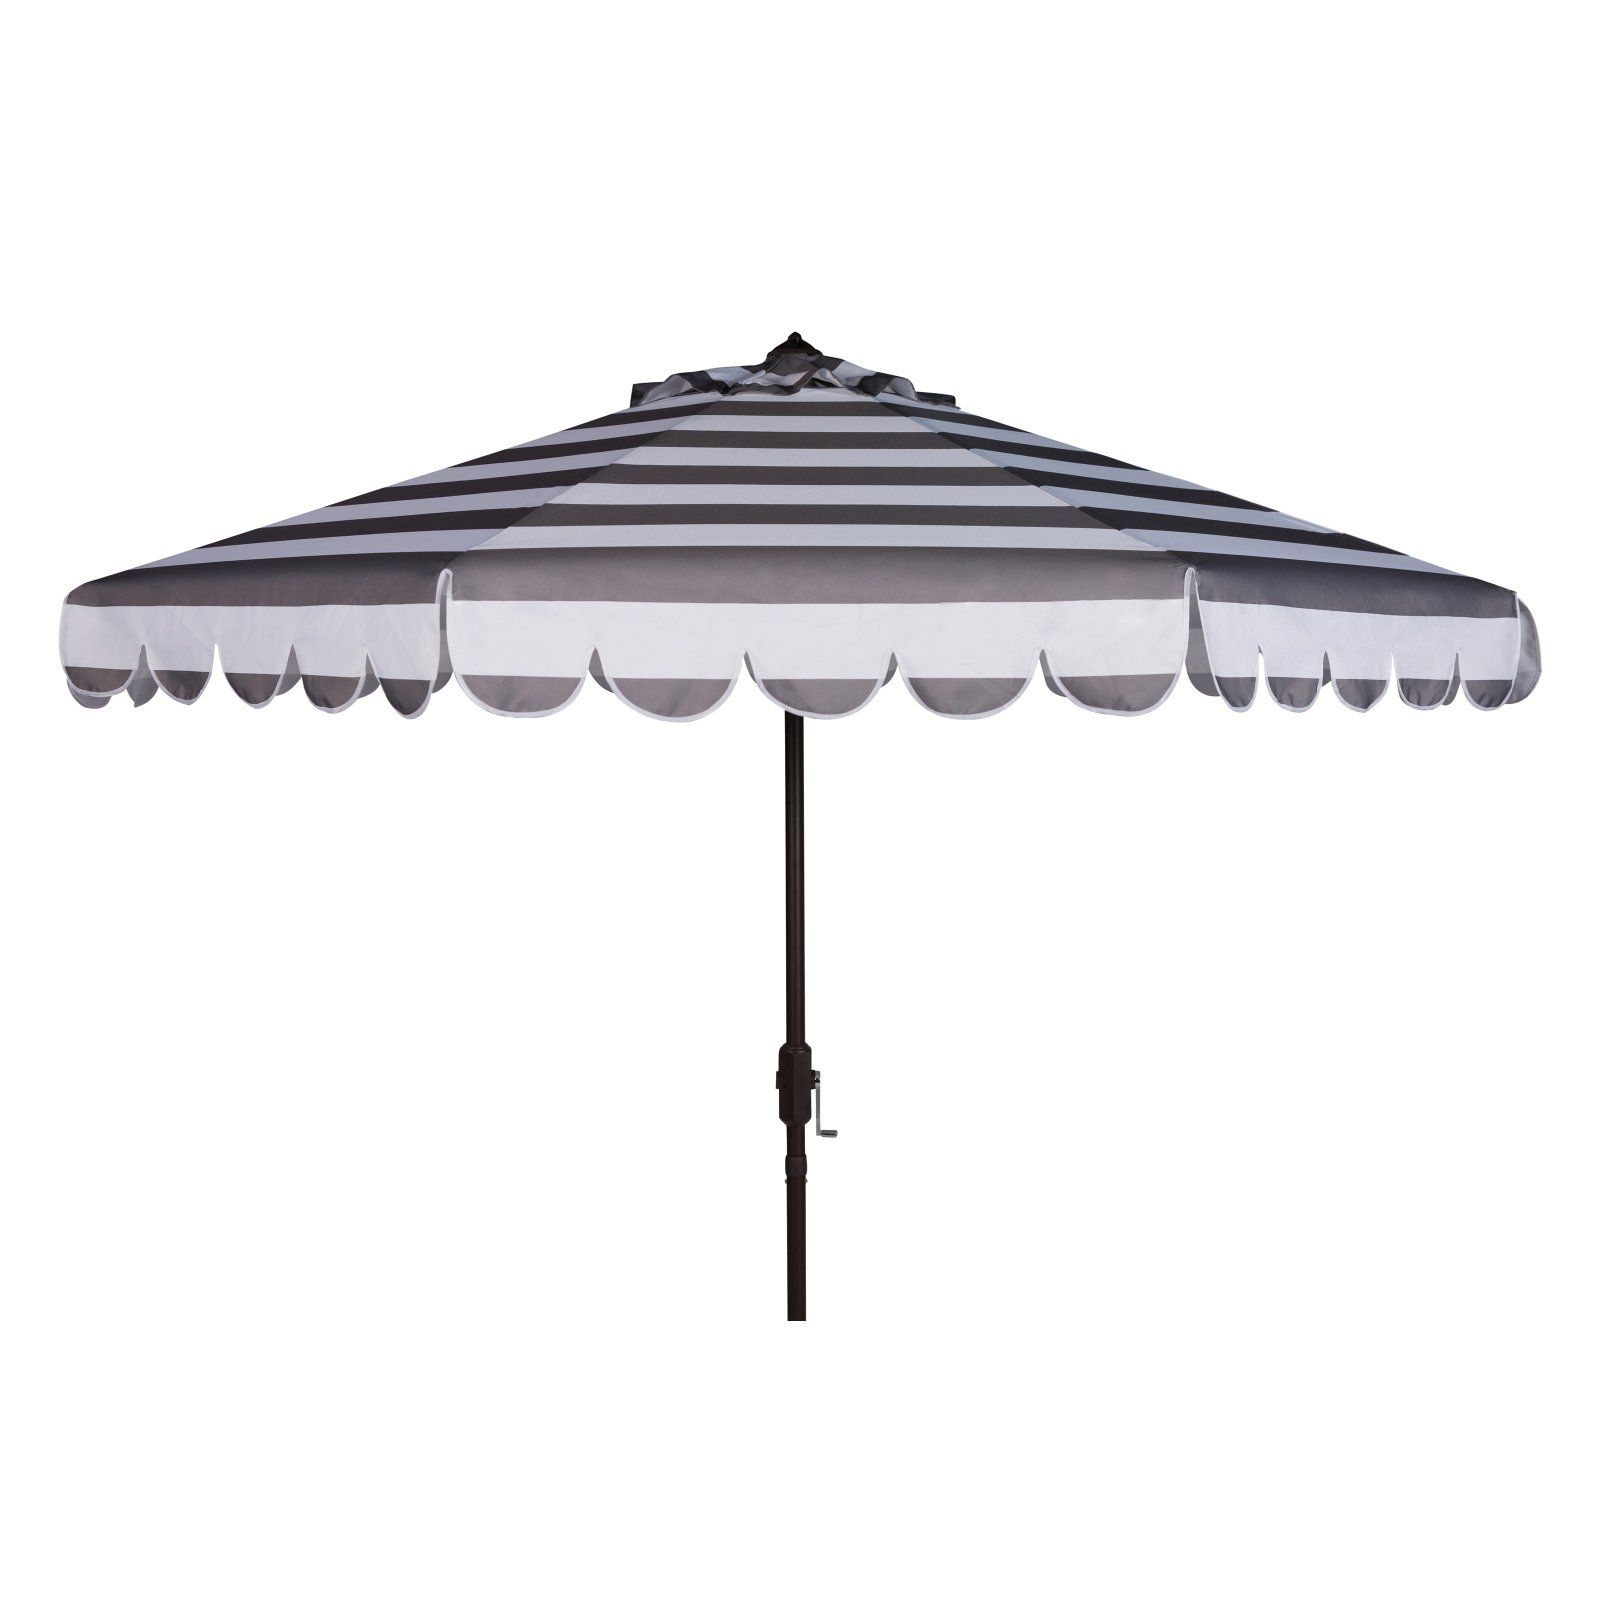 10 Ways To Make A Big Outdoor Statement Patio Umbrellas Outdoor